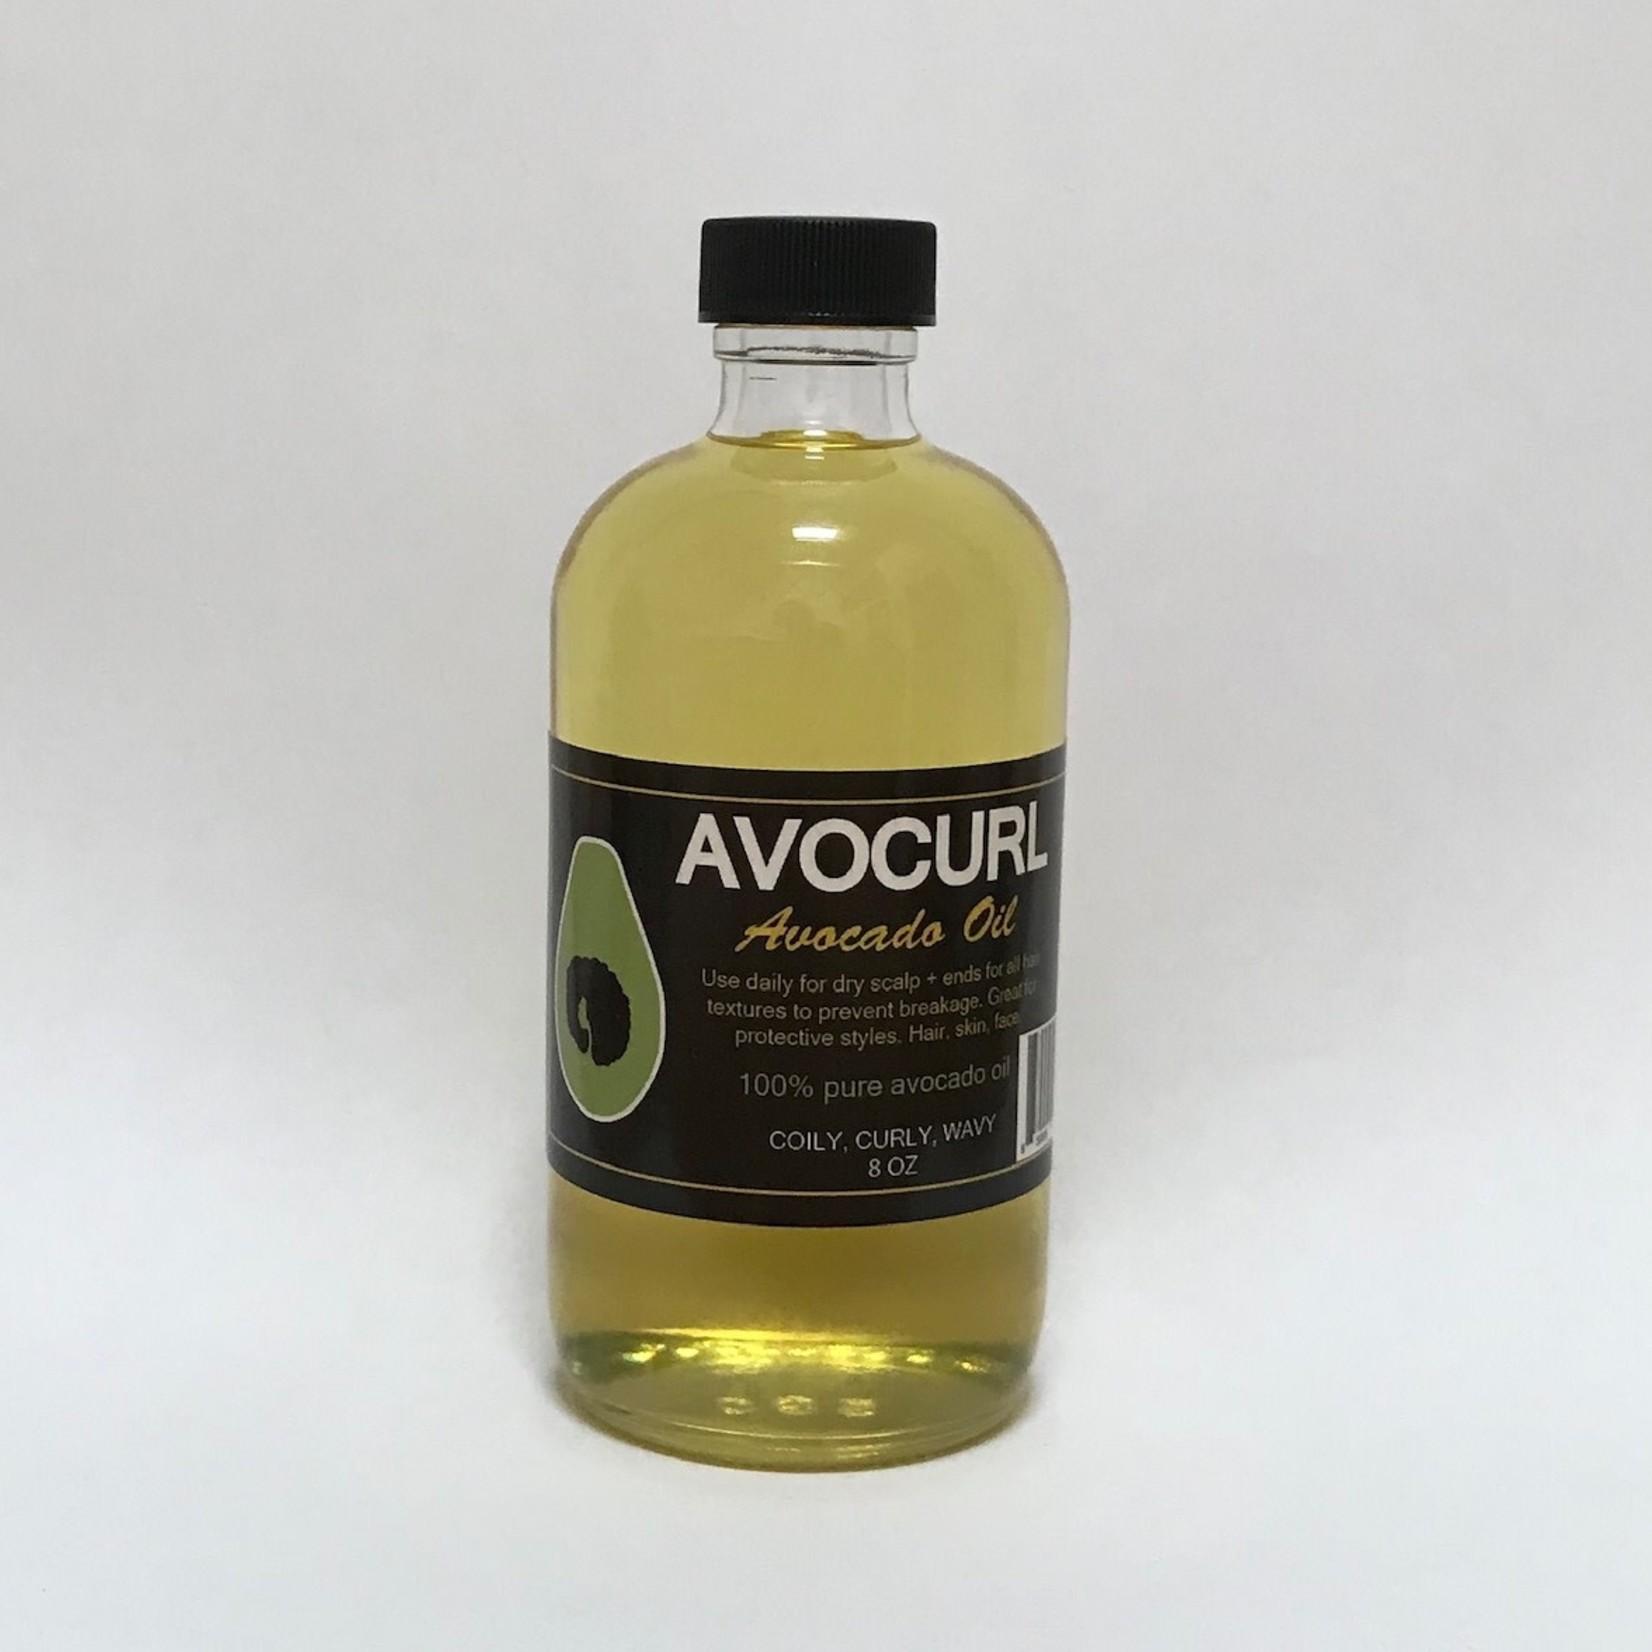 AVOCURL Avocado Oil